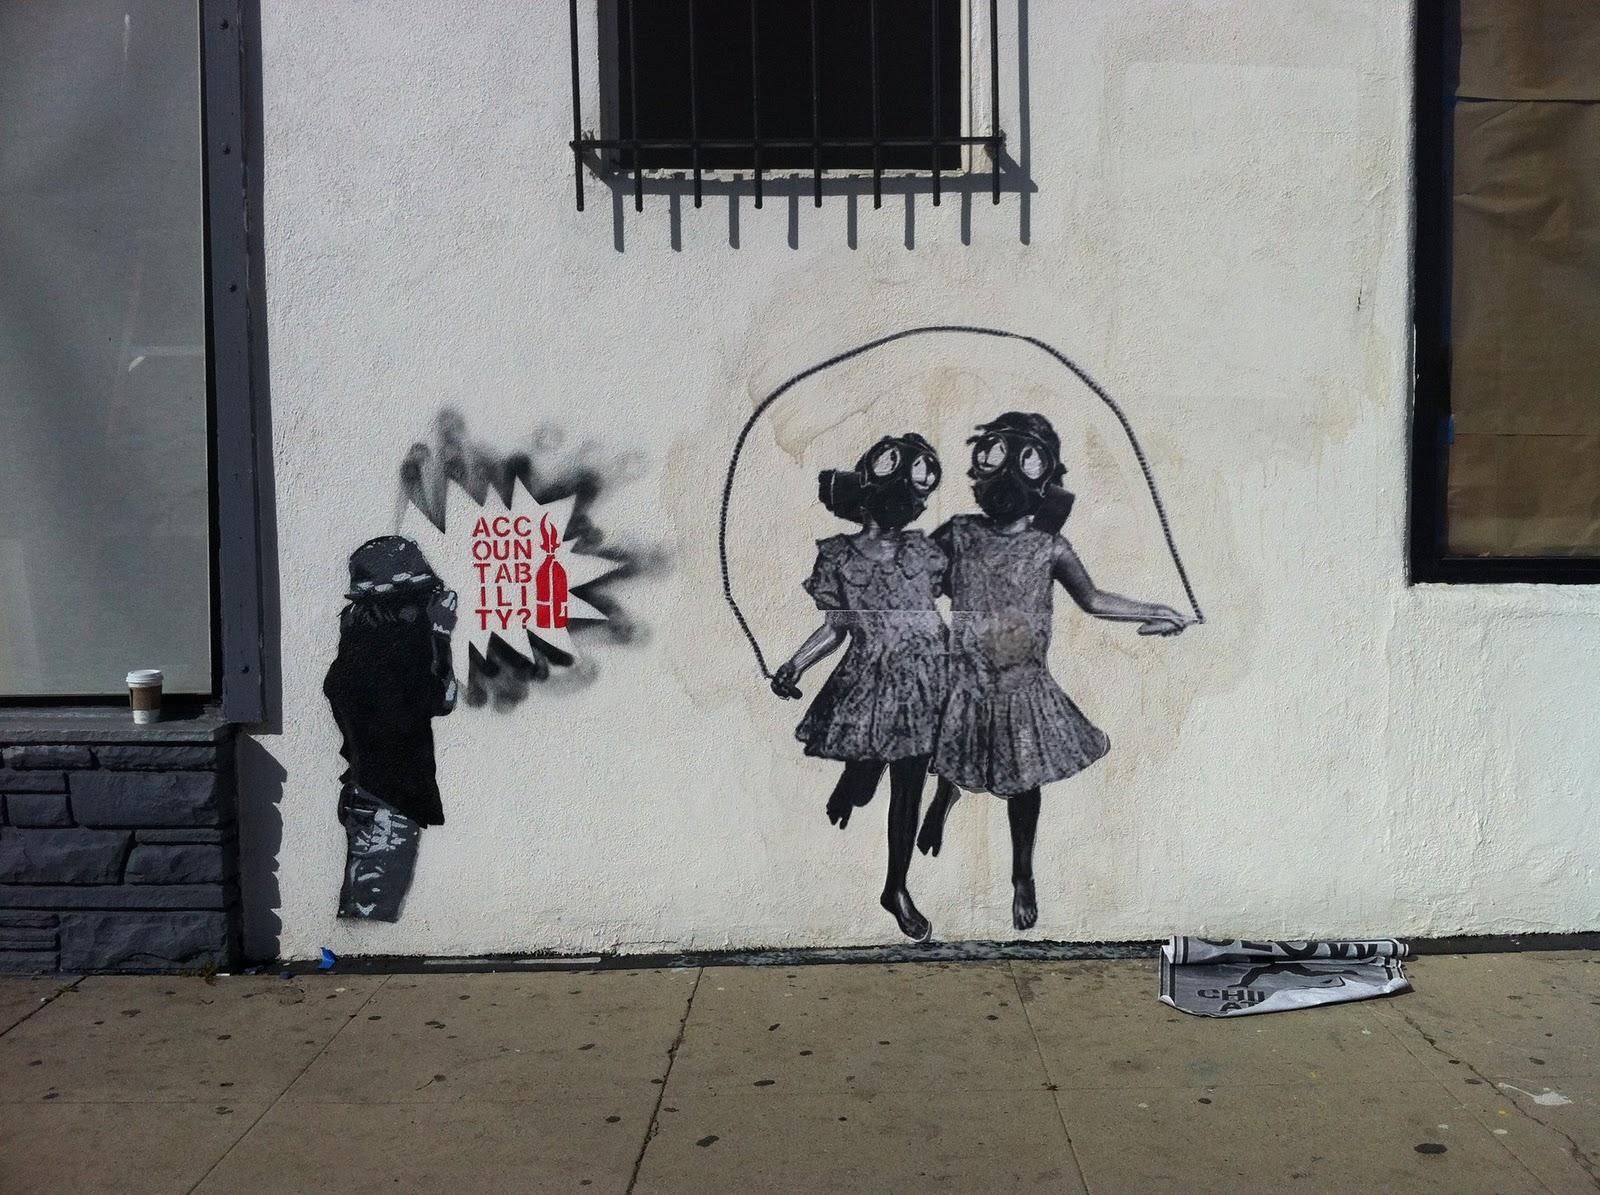 banksy graffiti political - photo #3